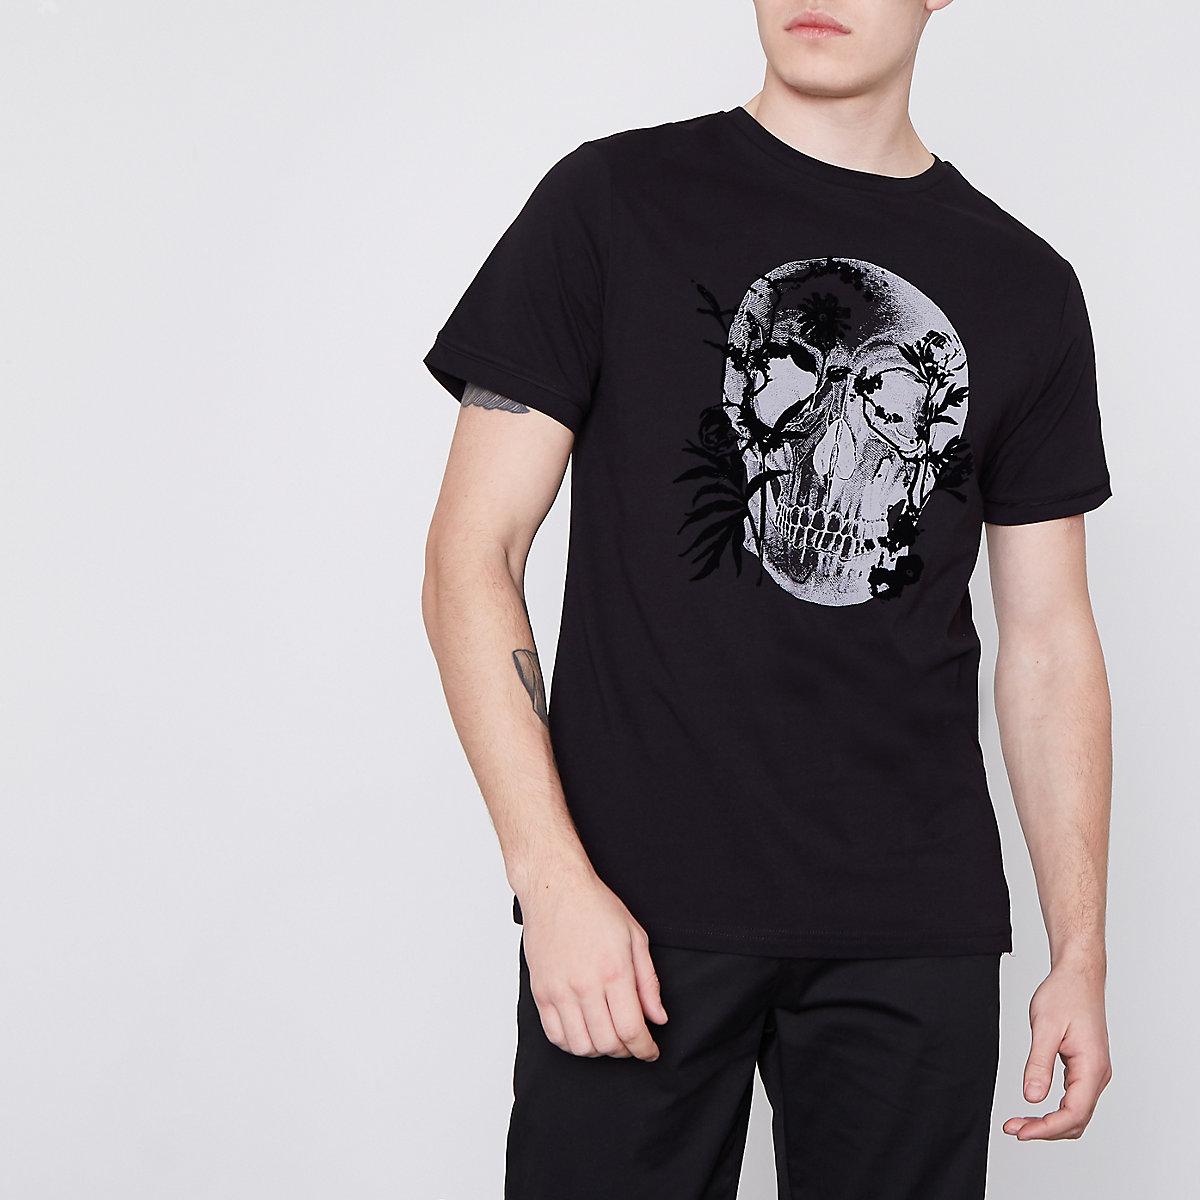 Schwarzes, schmales T-Shirt mit floralem Totenkopf-Print